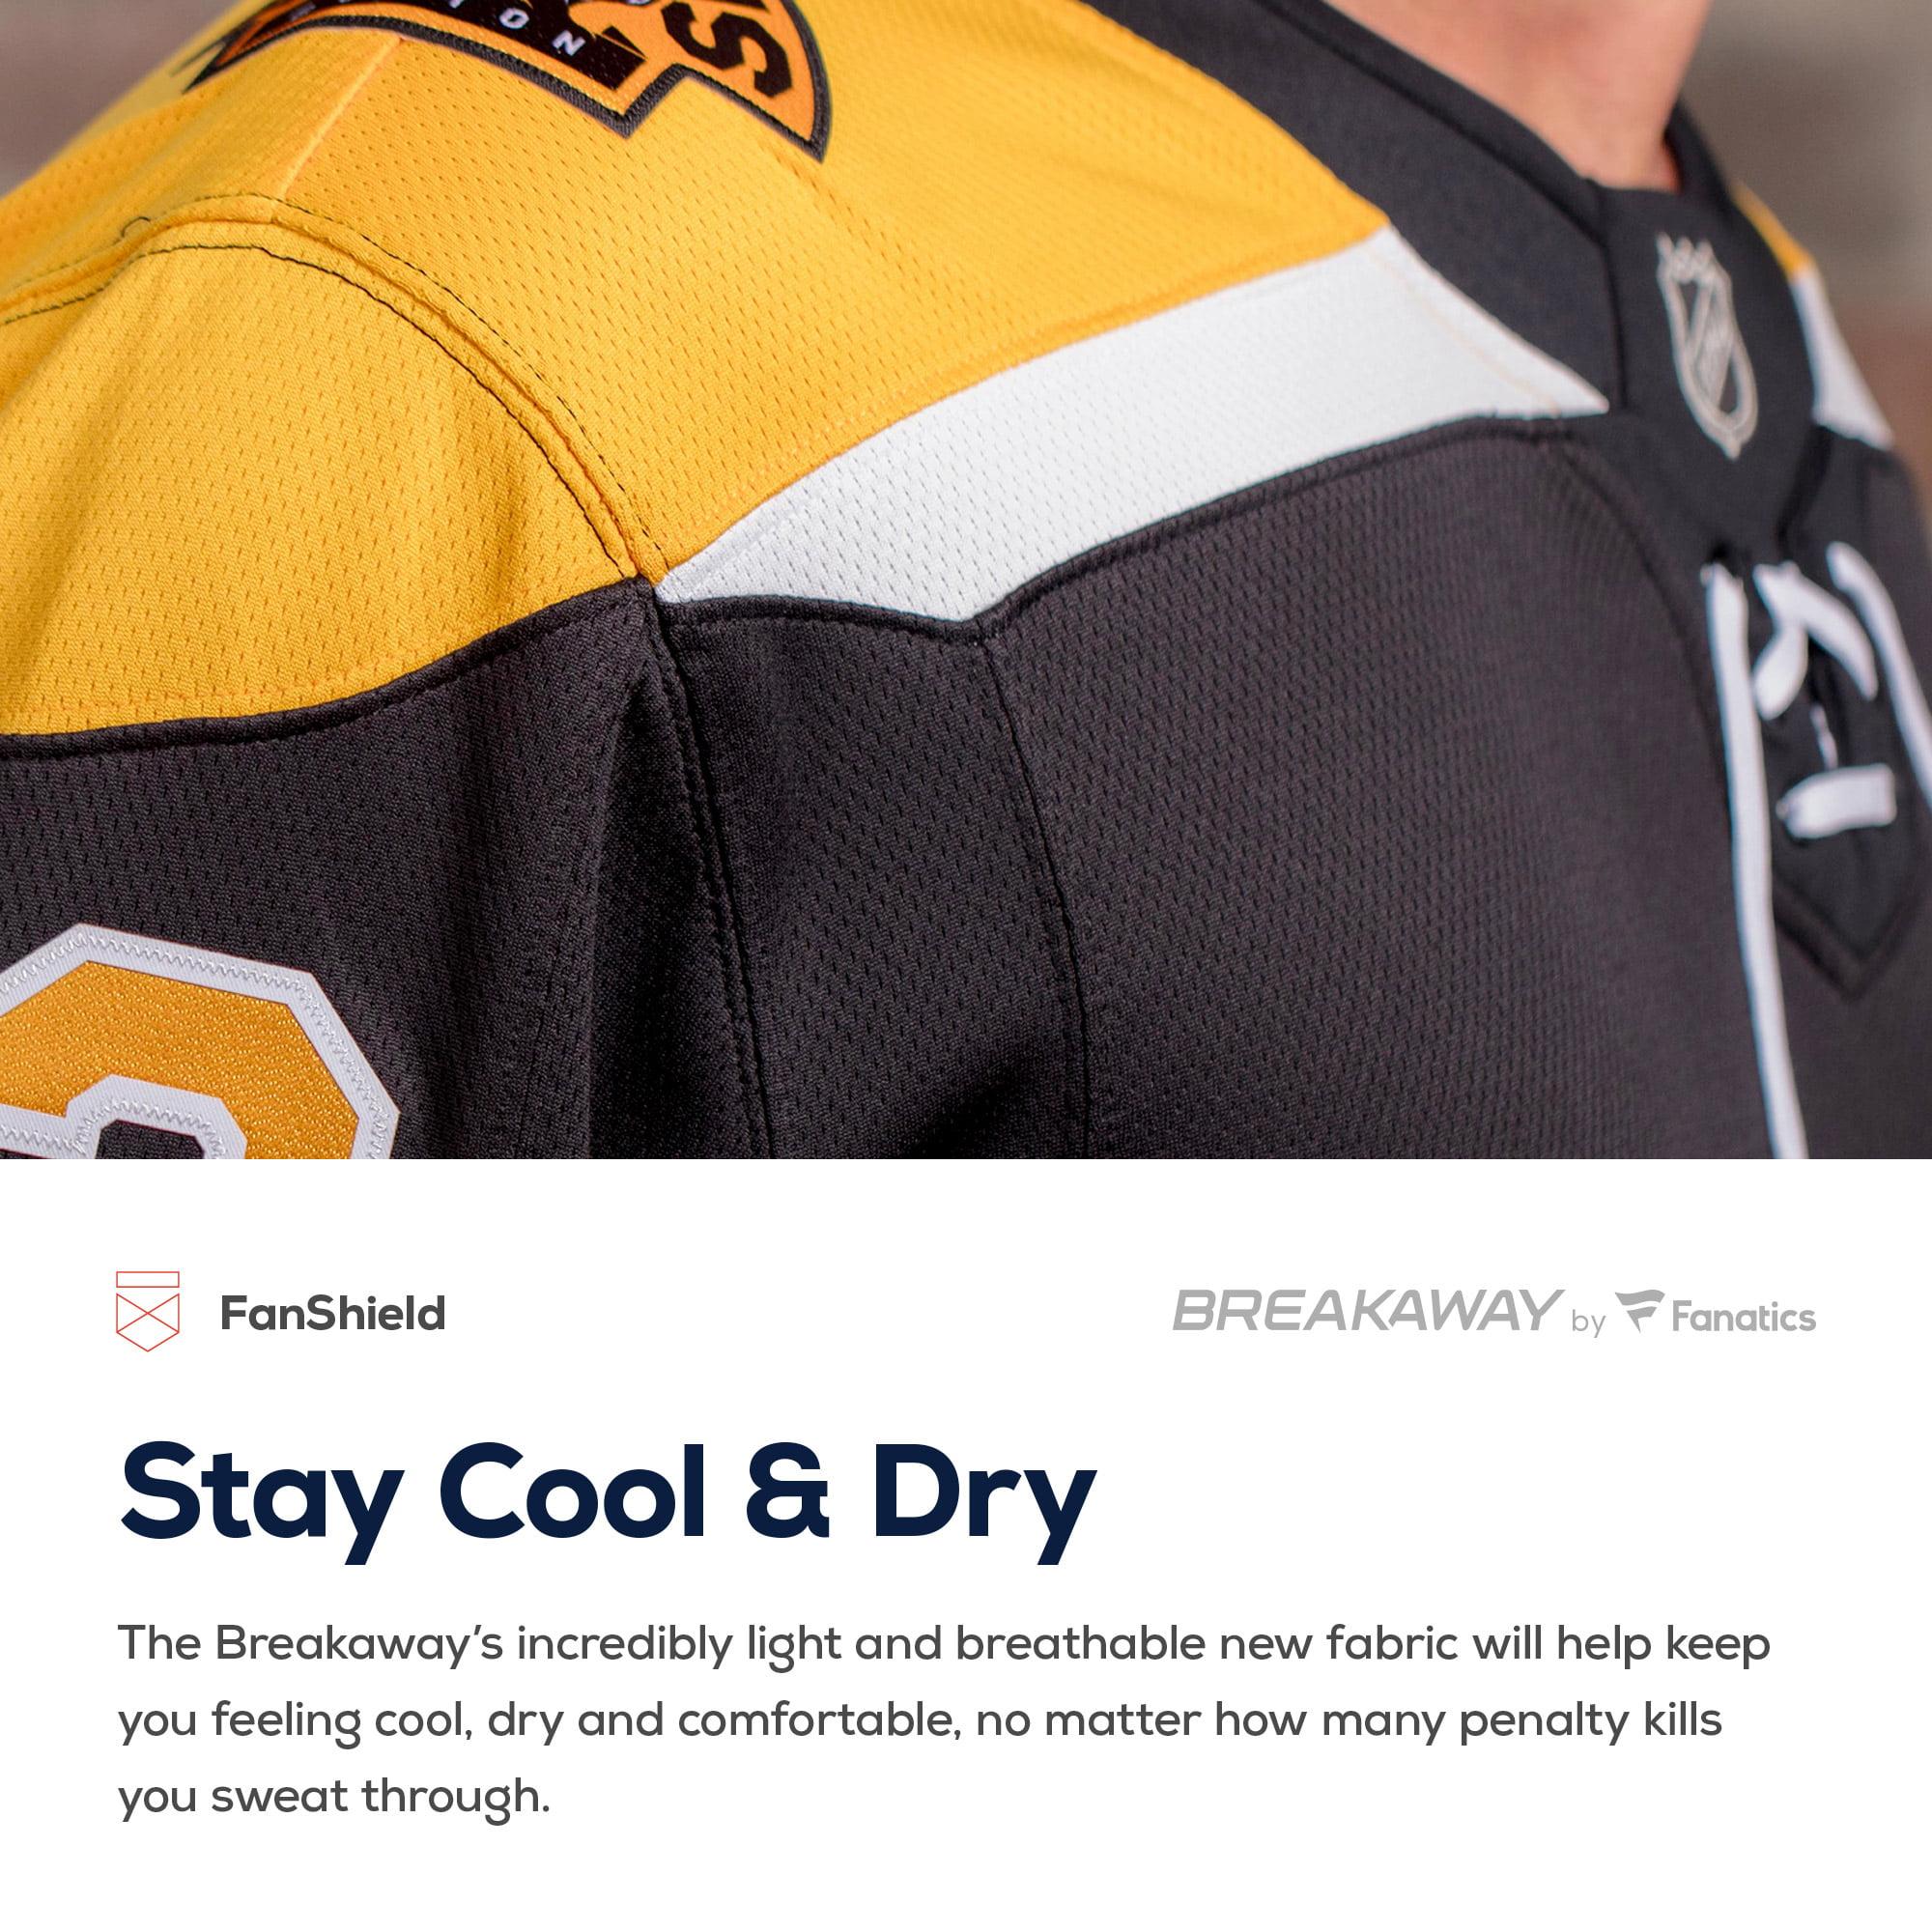 cad00f7a8 Patrice Bergeron Boston Bruins Fanatics Branded 2019 Winter Classic  Breakaway Player Jersey - White - Walmart.com